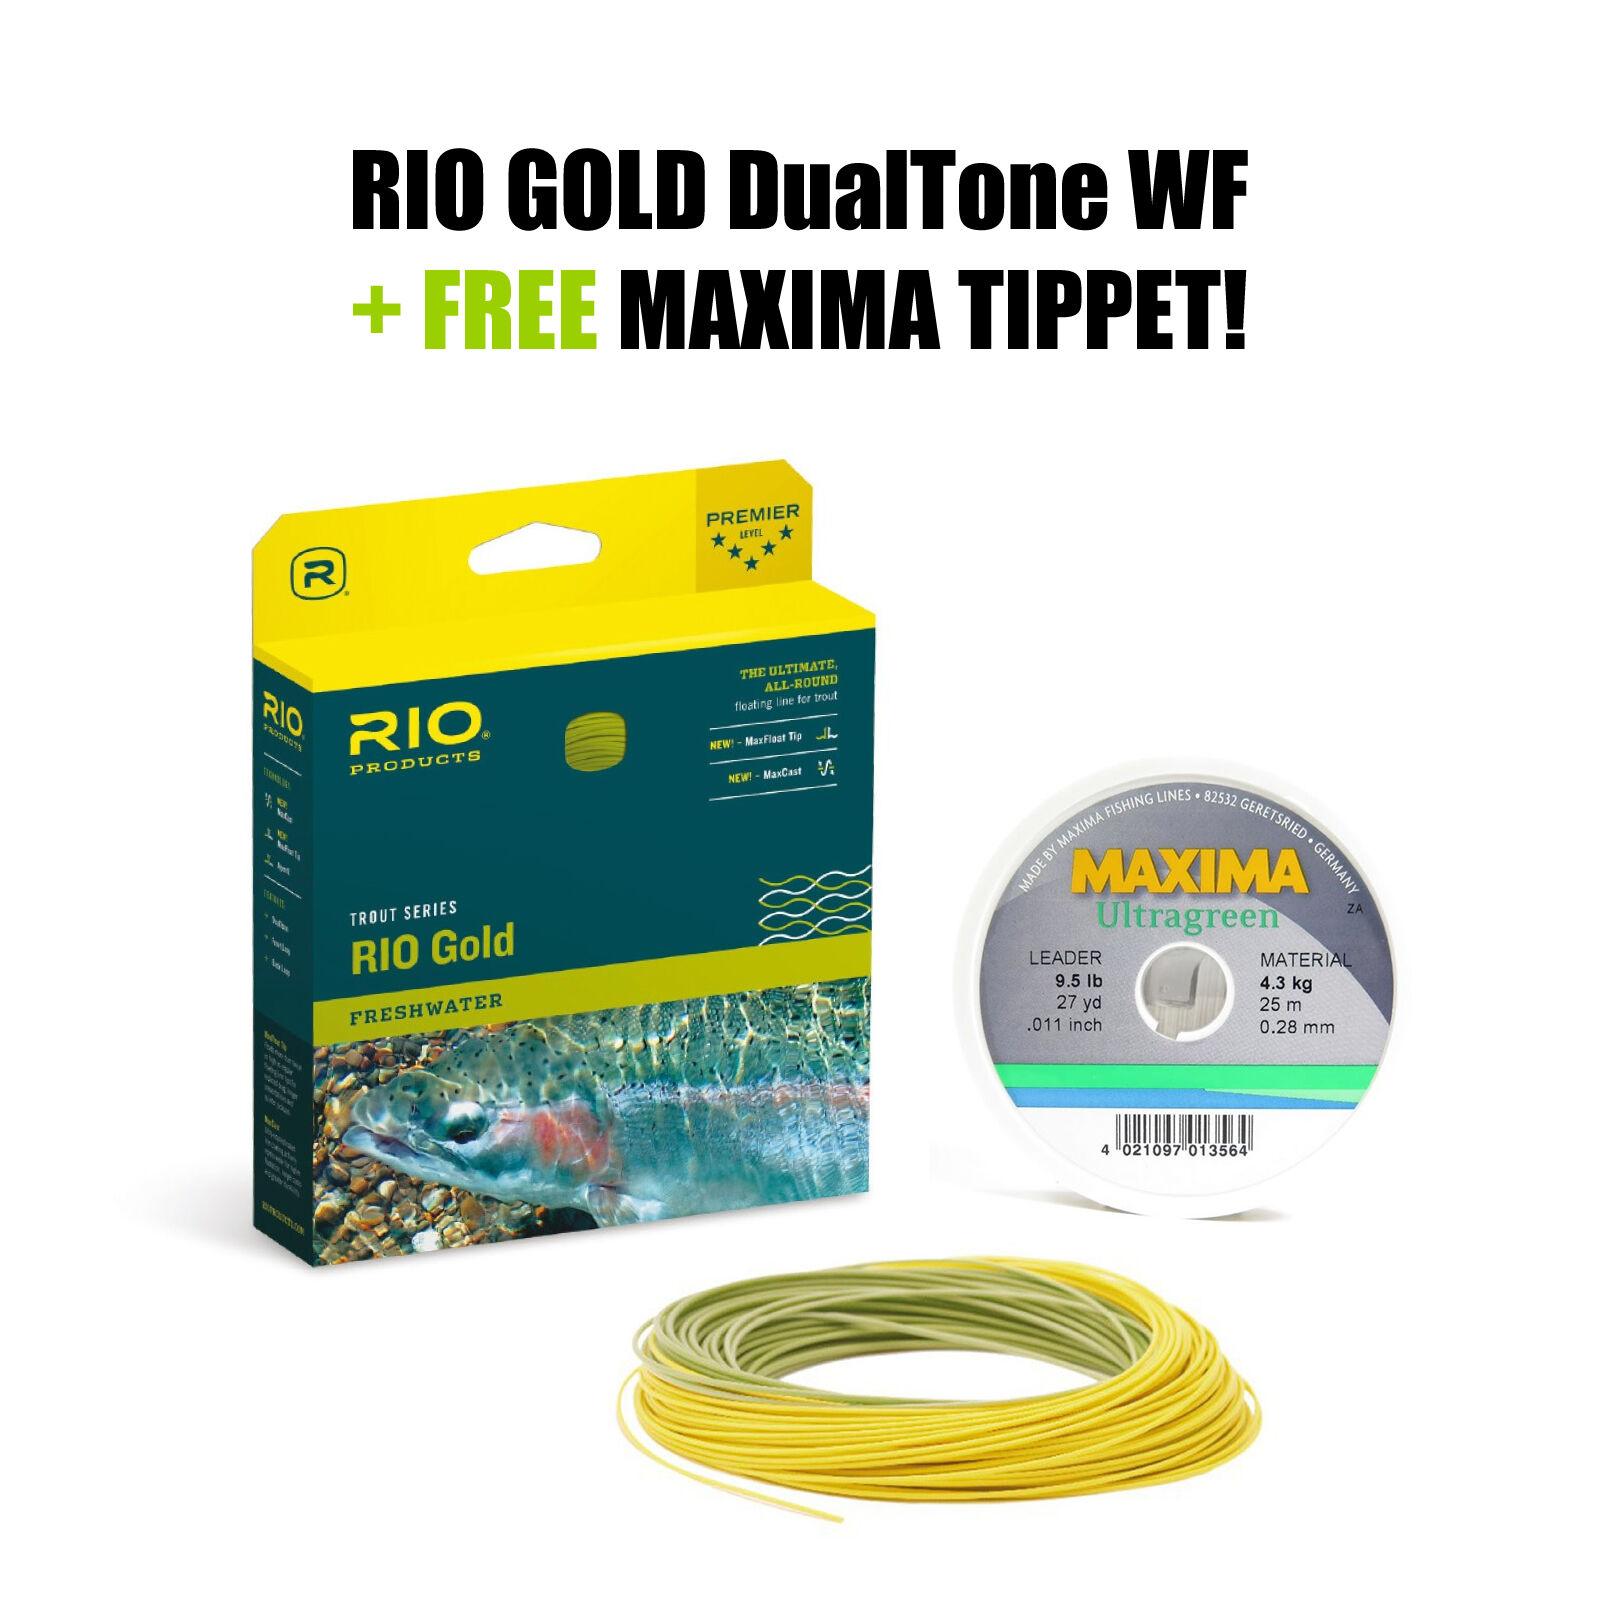 RIO gold DualTone WF5 Floating - Fliegenschnur - Fly Line + FREE MAXIMA Tippet